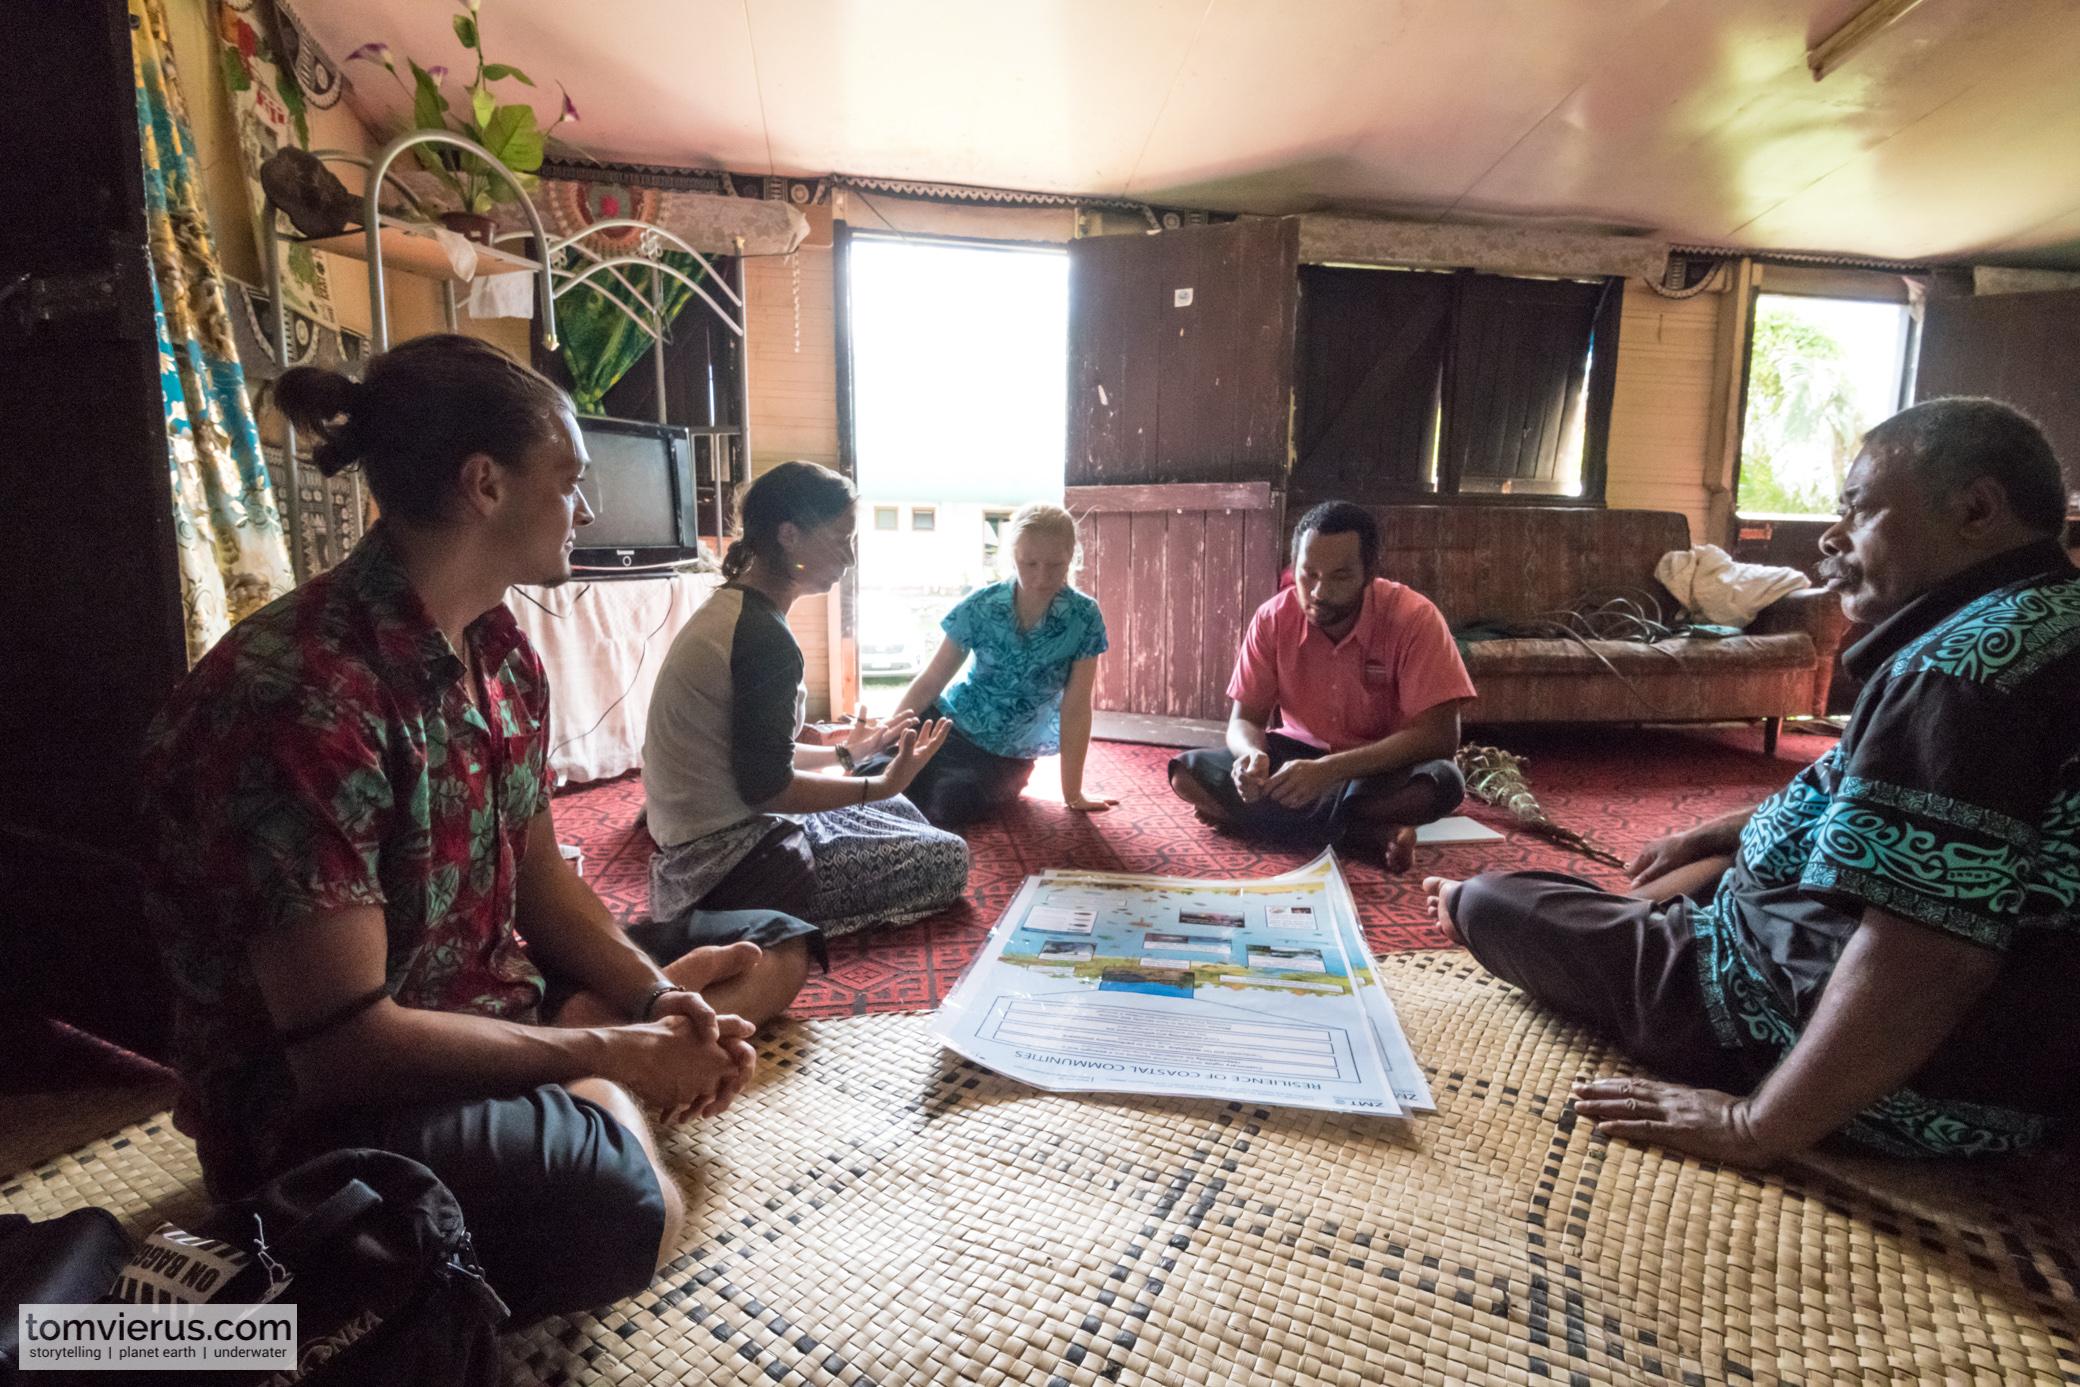 Fiji, REPICORE, Expedition, Filmmaker